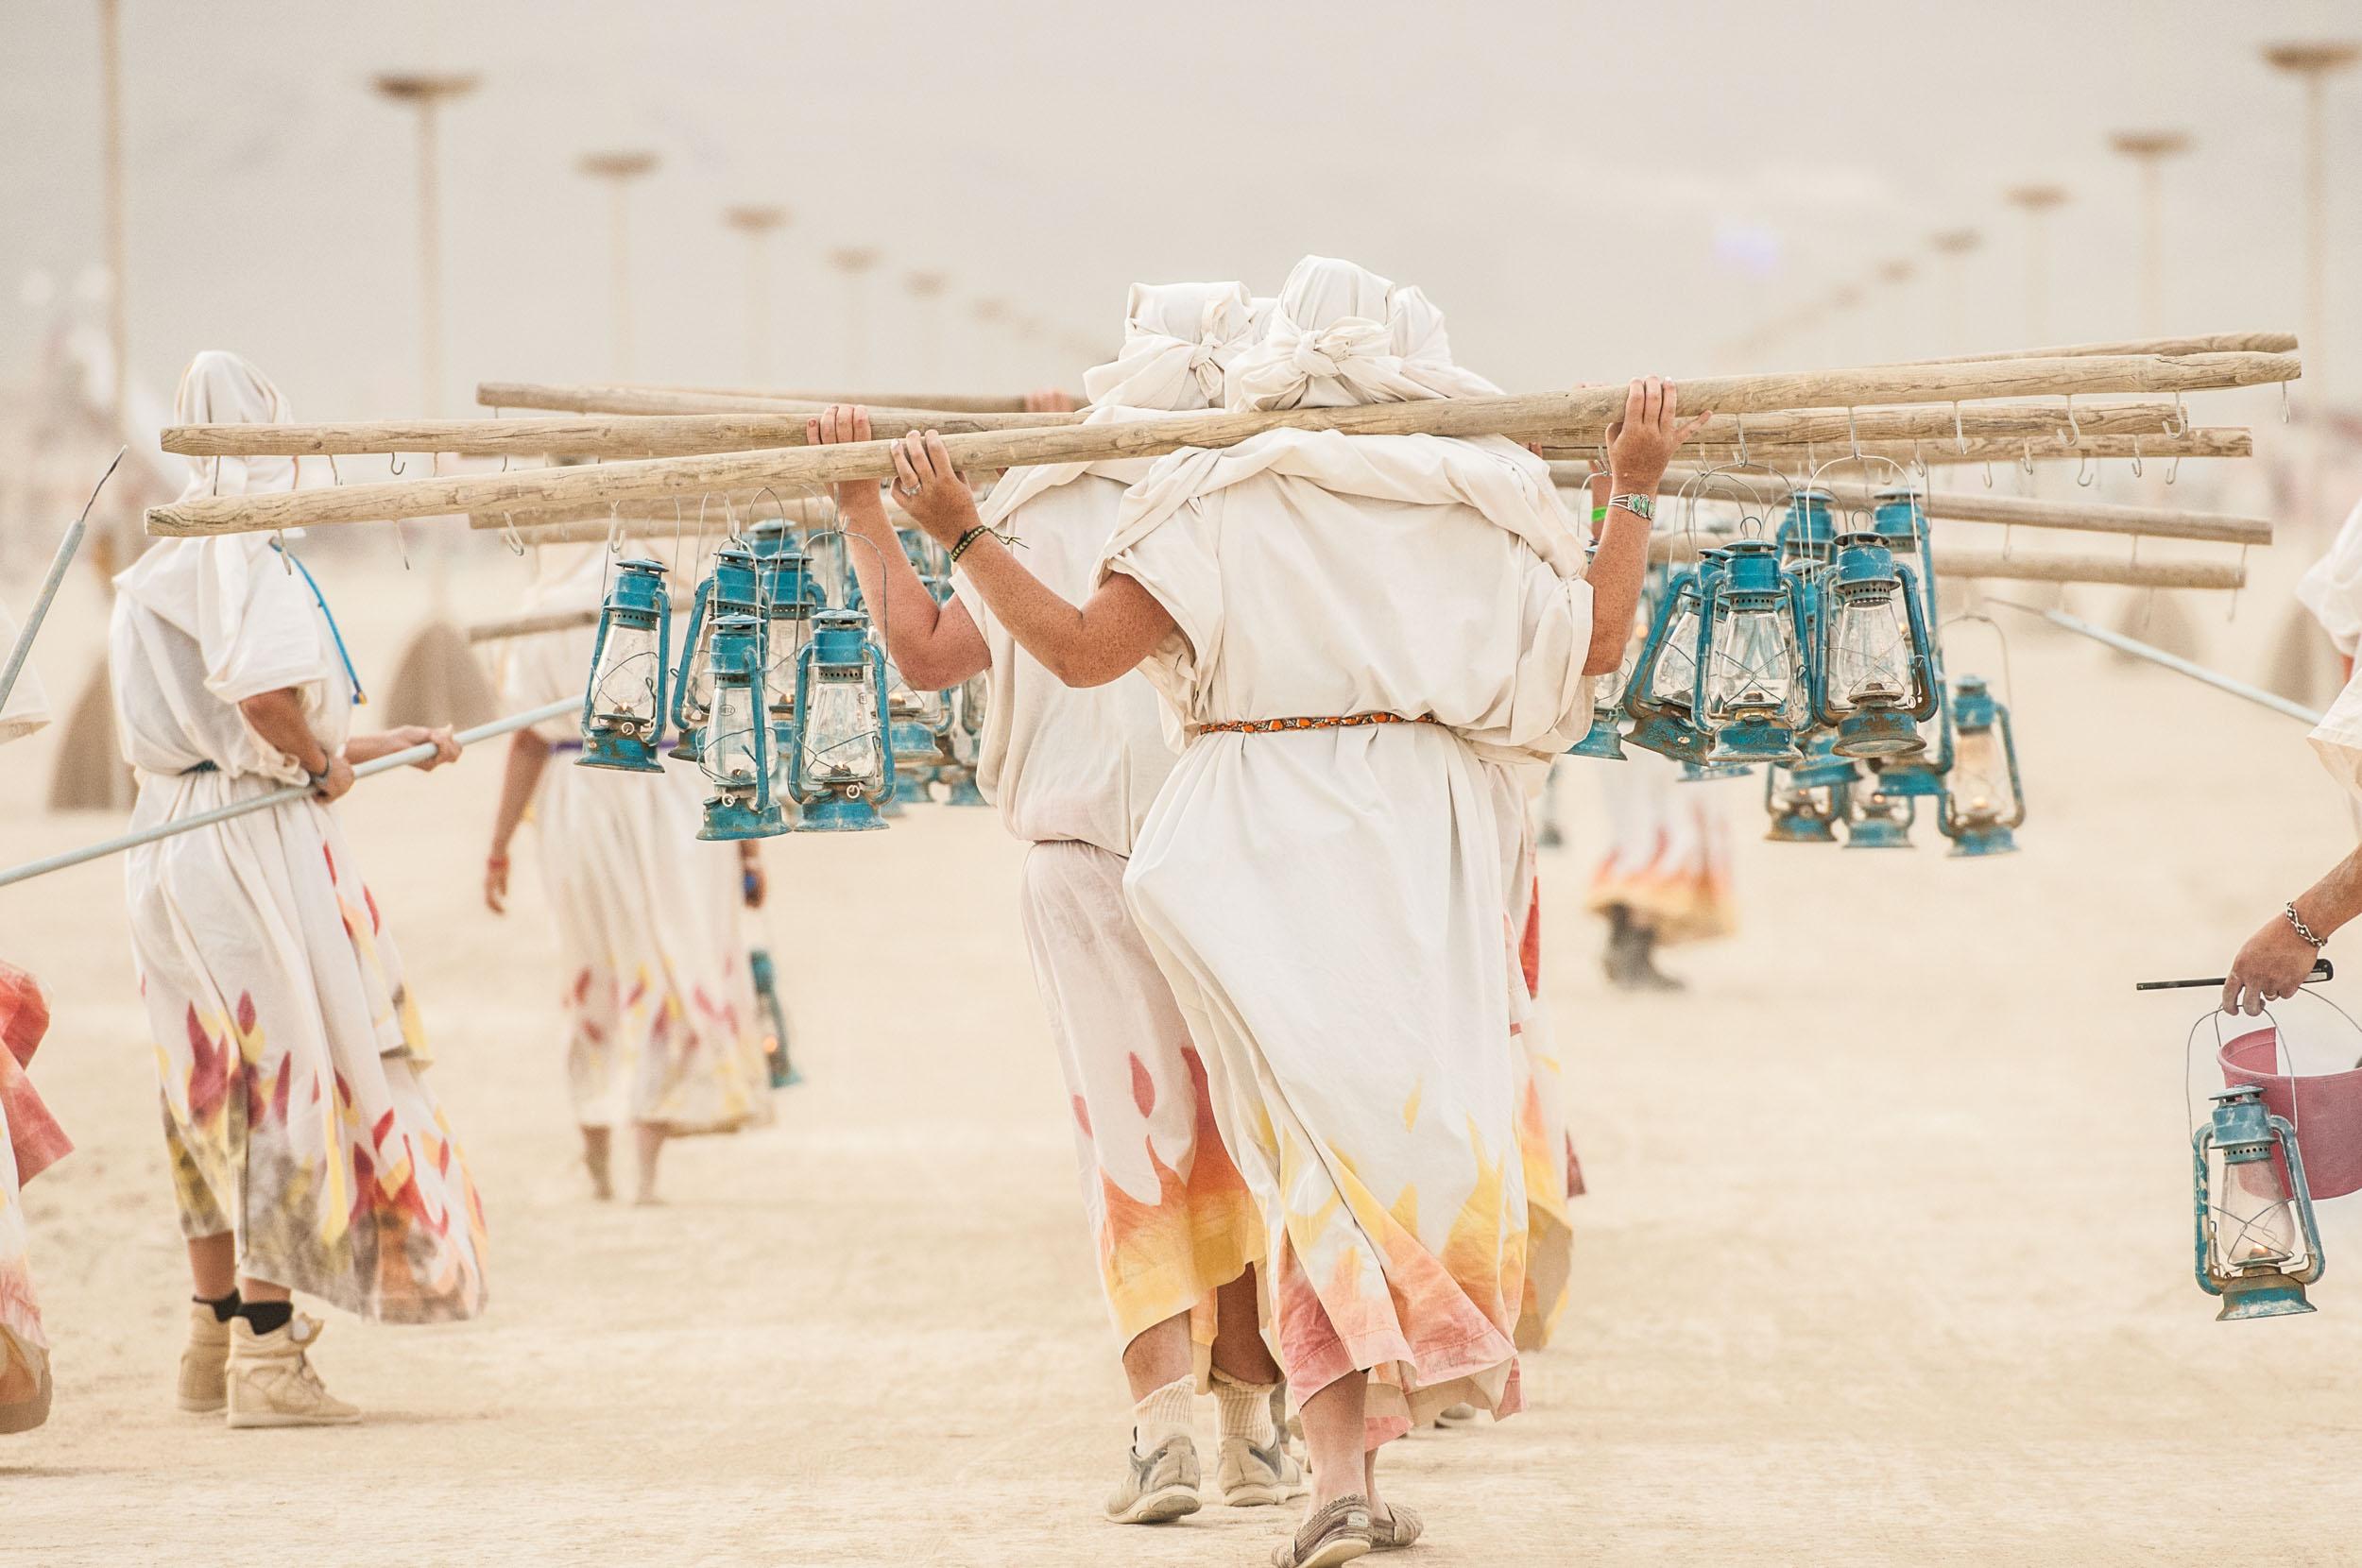 Burning man lantern carriers - Photo credit Nicola Bailey.jpg